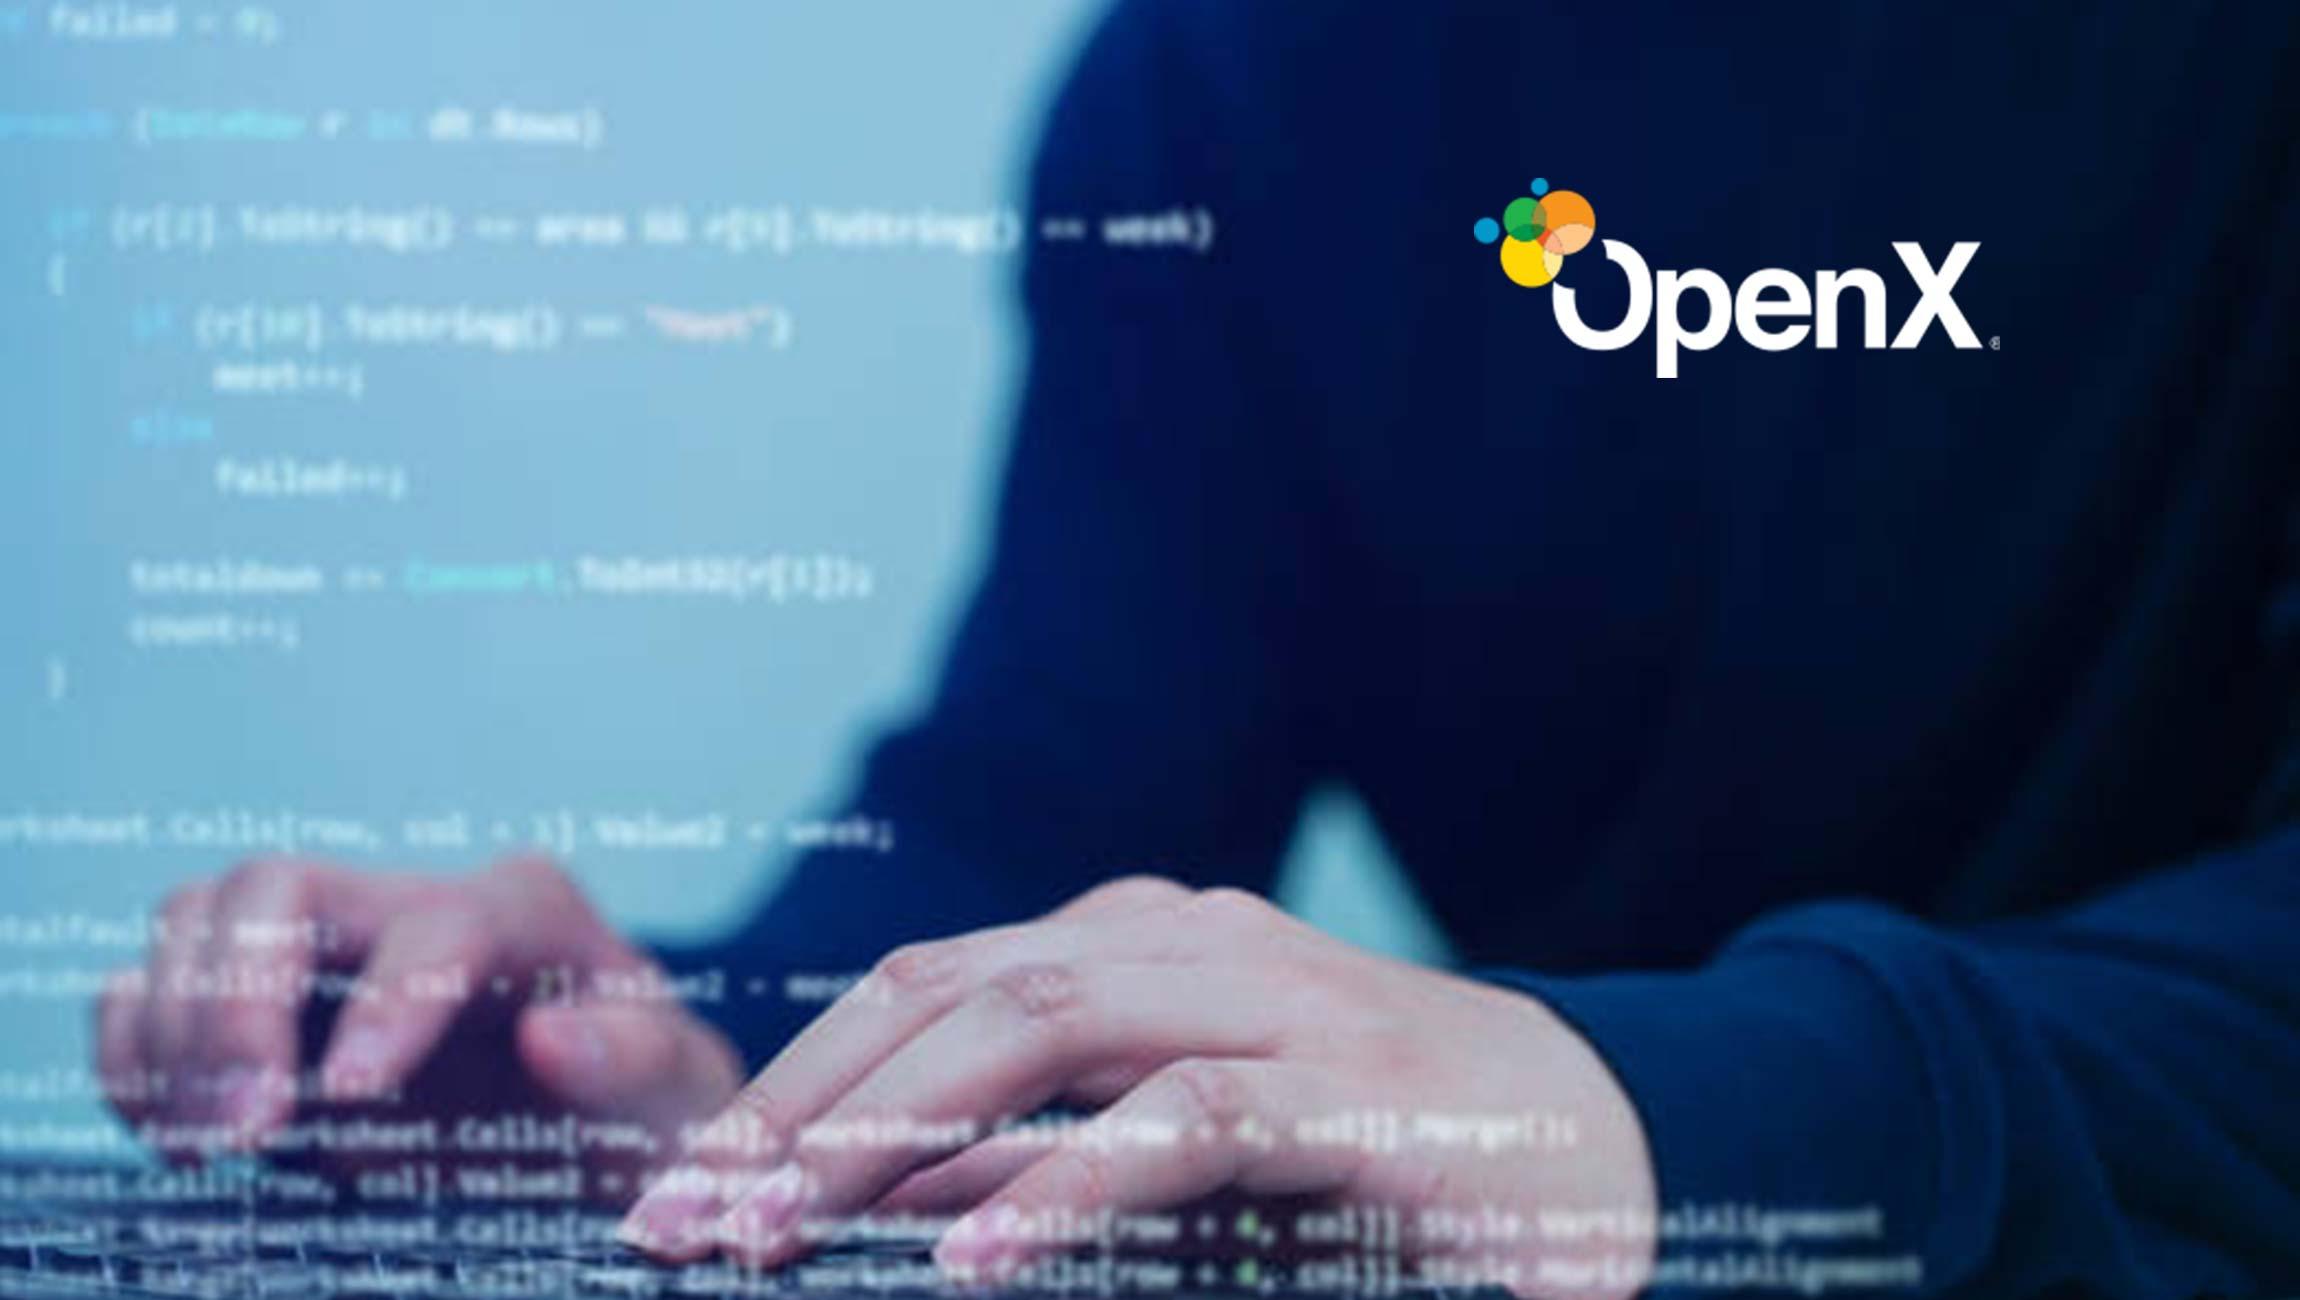 OpenX Bidding Intelligence Data Set (BIDS) Simplifies Log-level Reporting in Programmatic AdTech